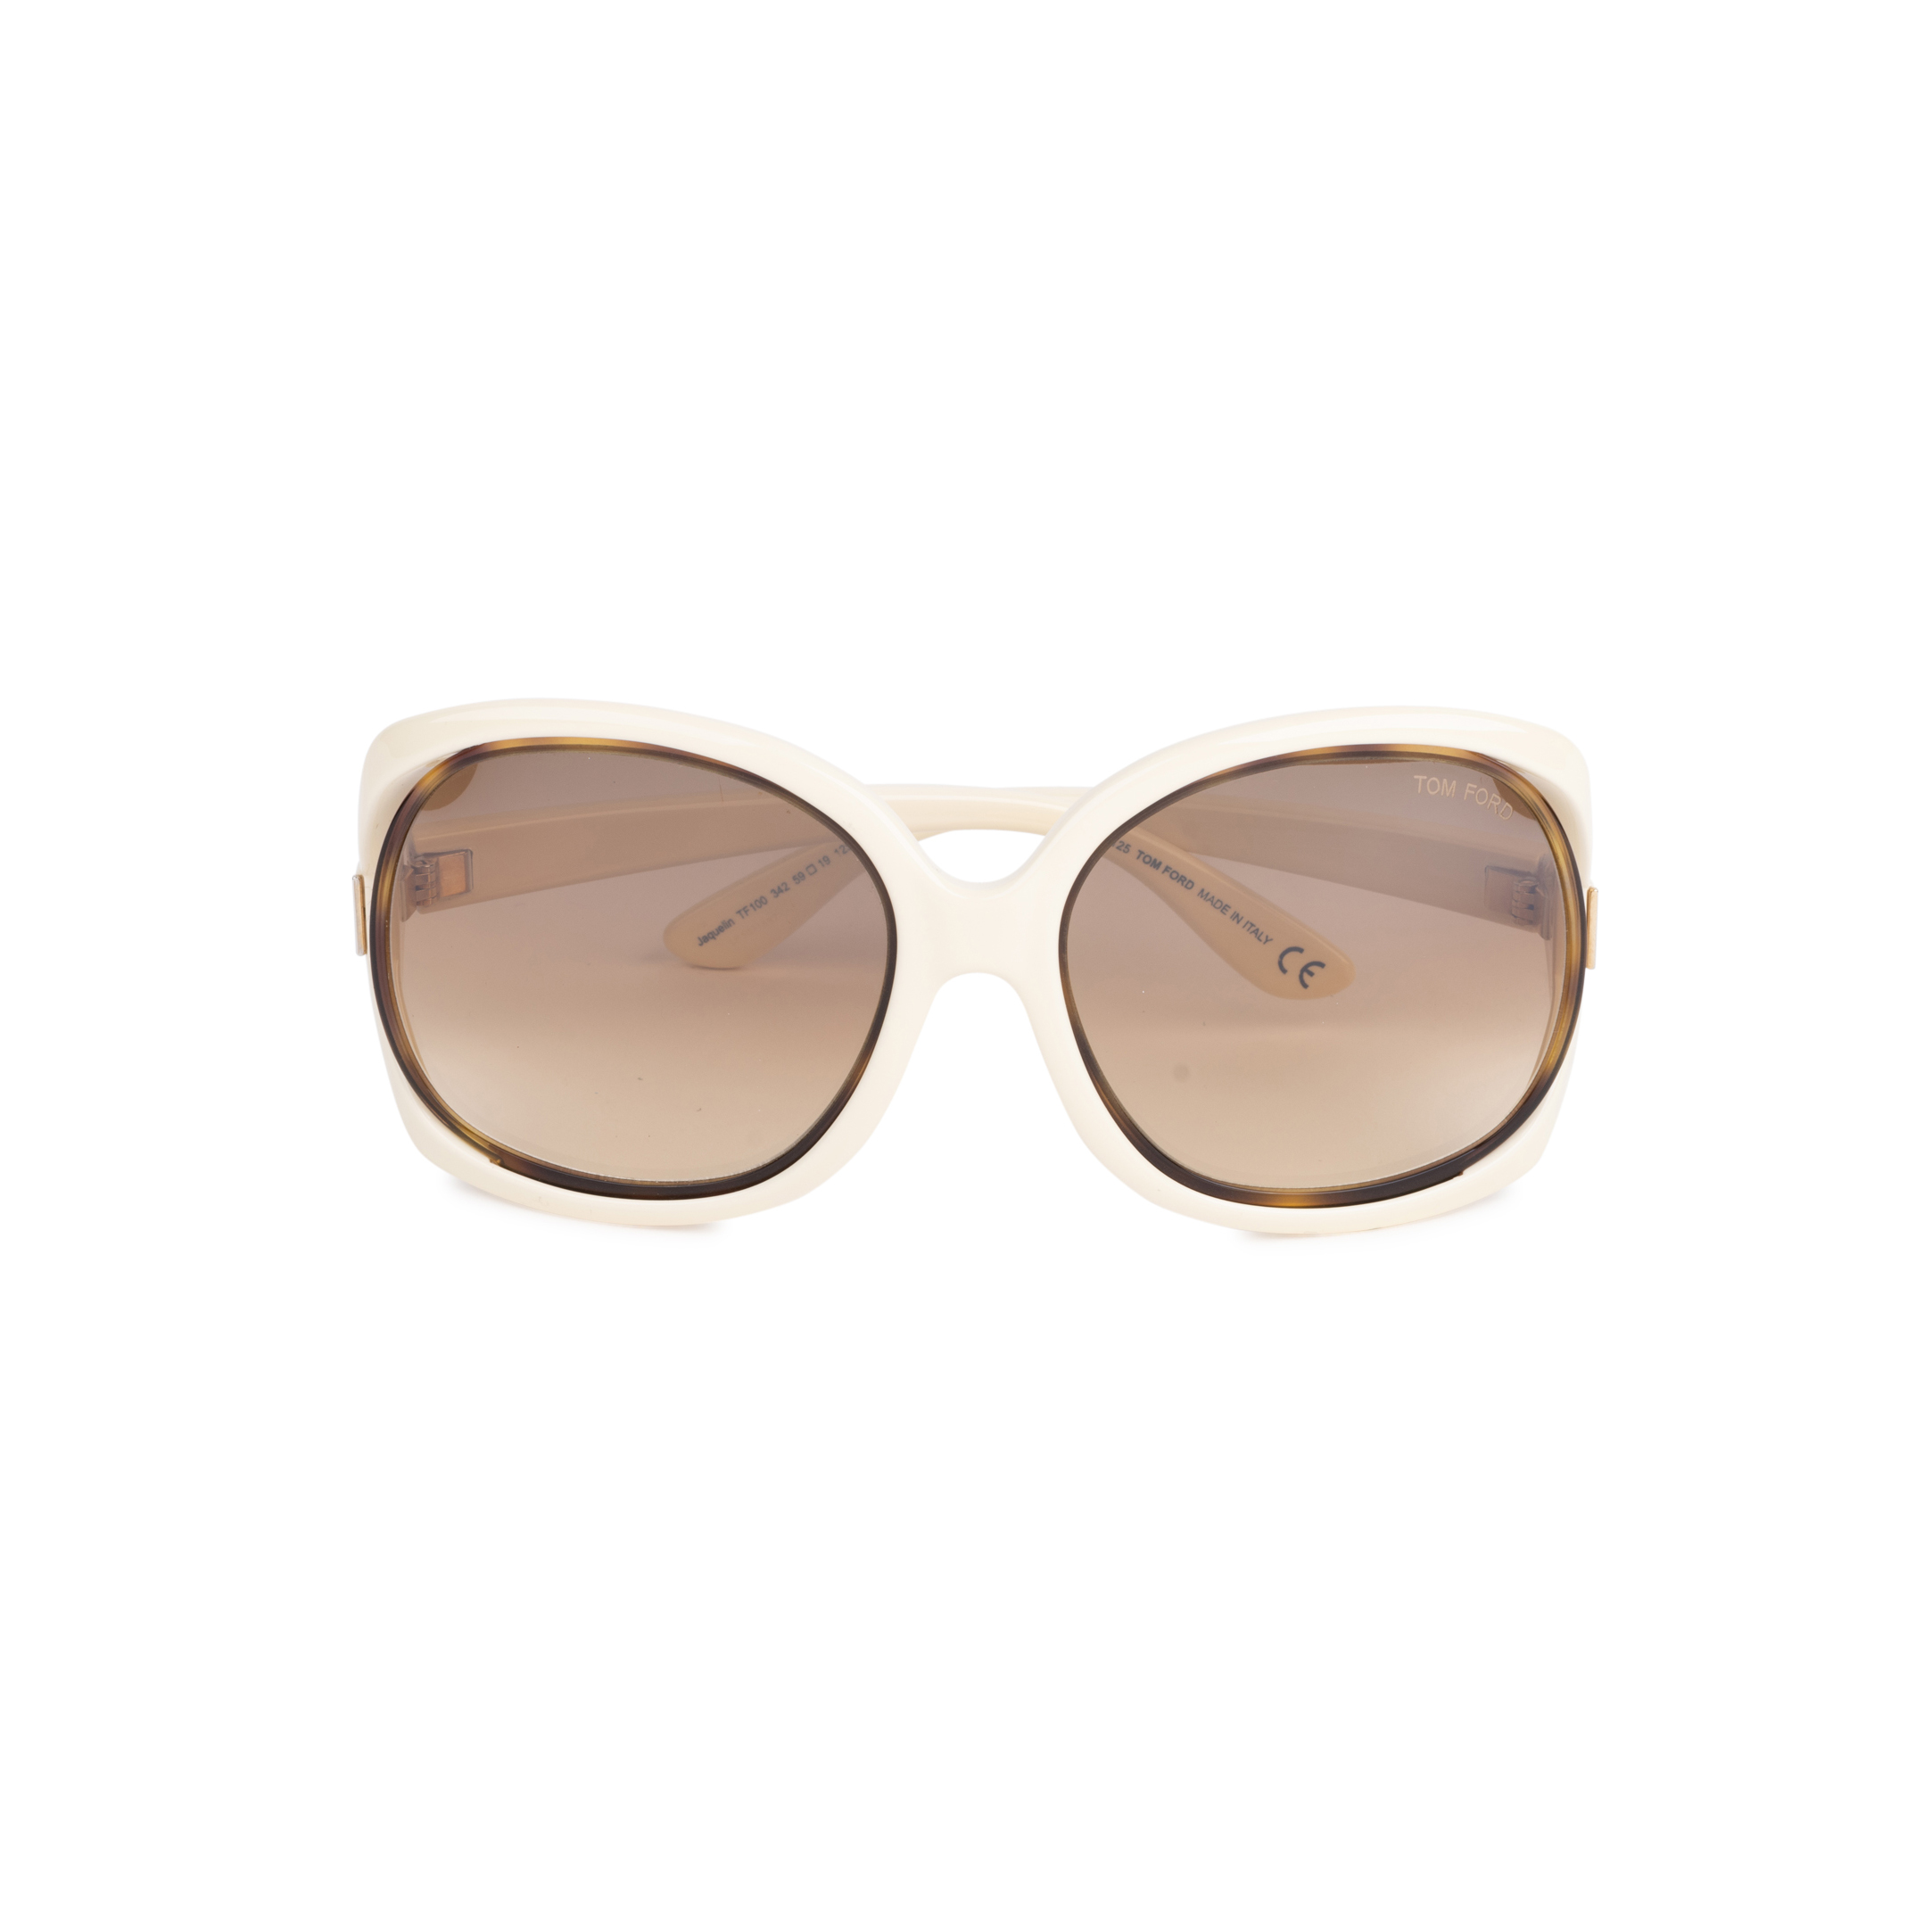 5d65de8cea Authentic Second Hand Tom Ford Jaquelin Sunglasses (PSS-577-00002 ...